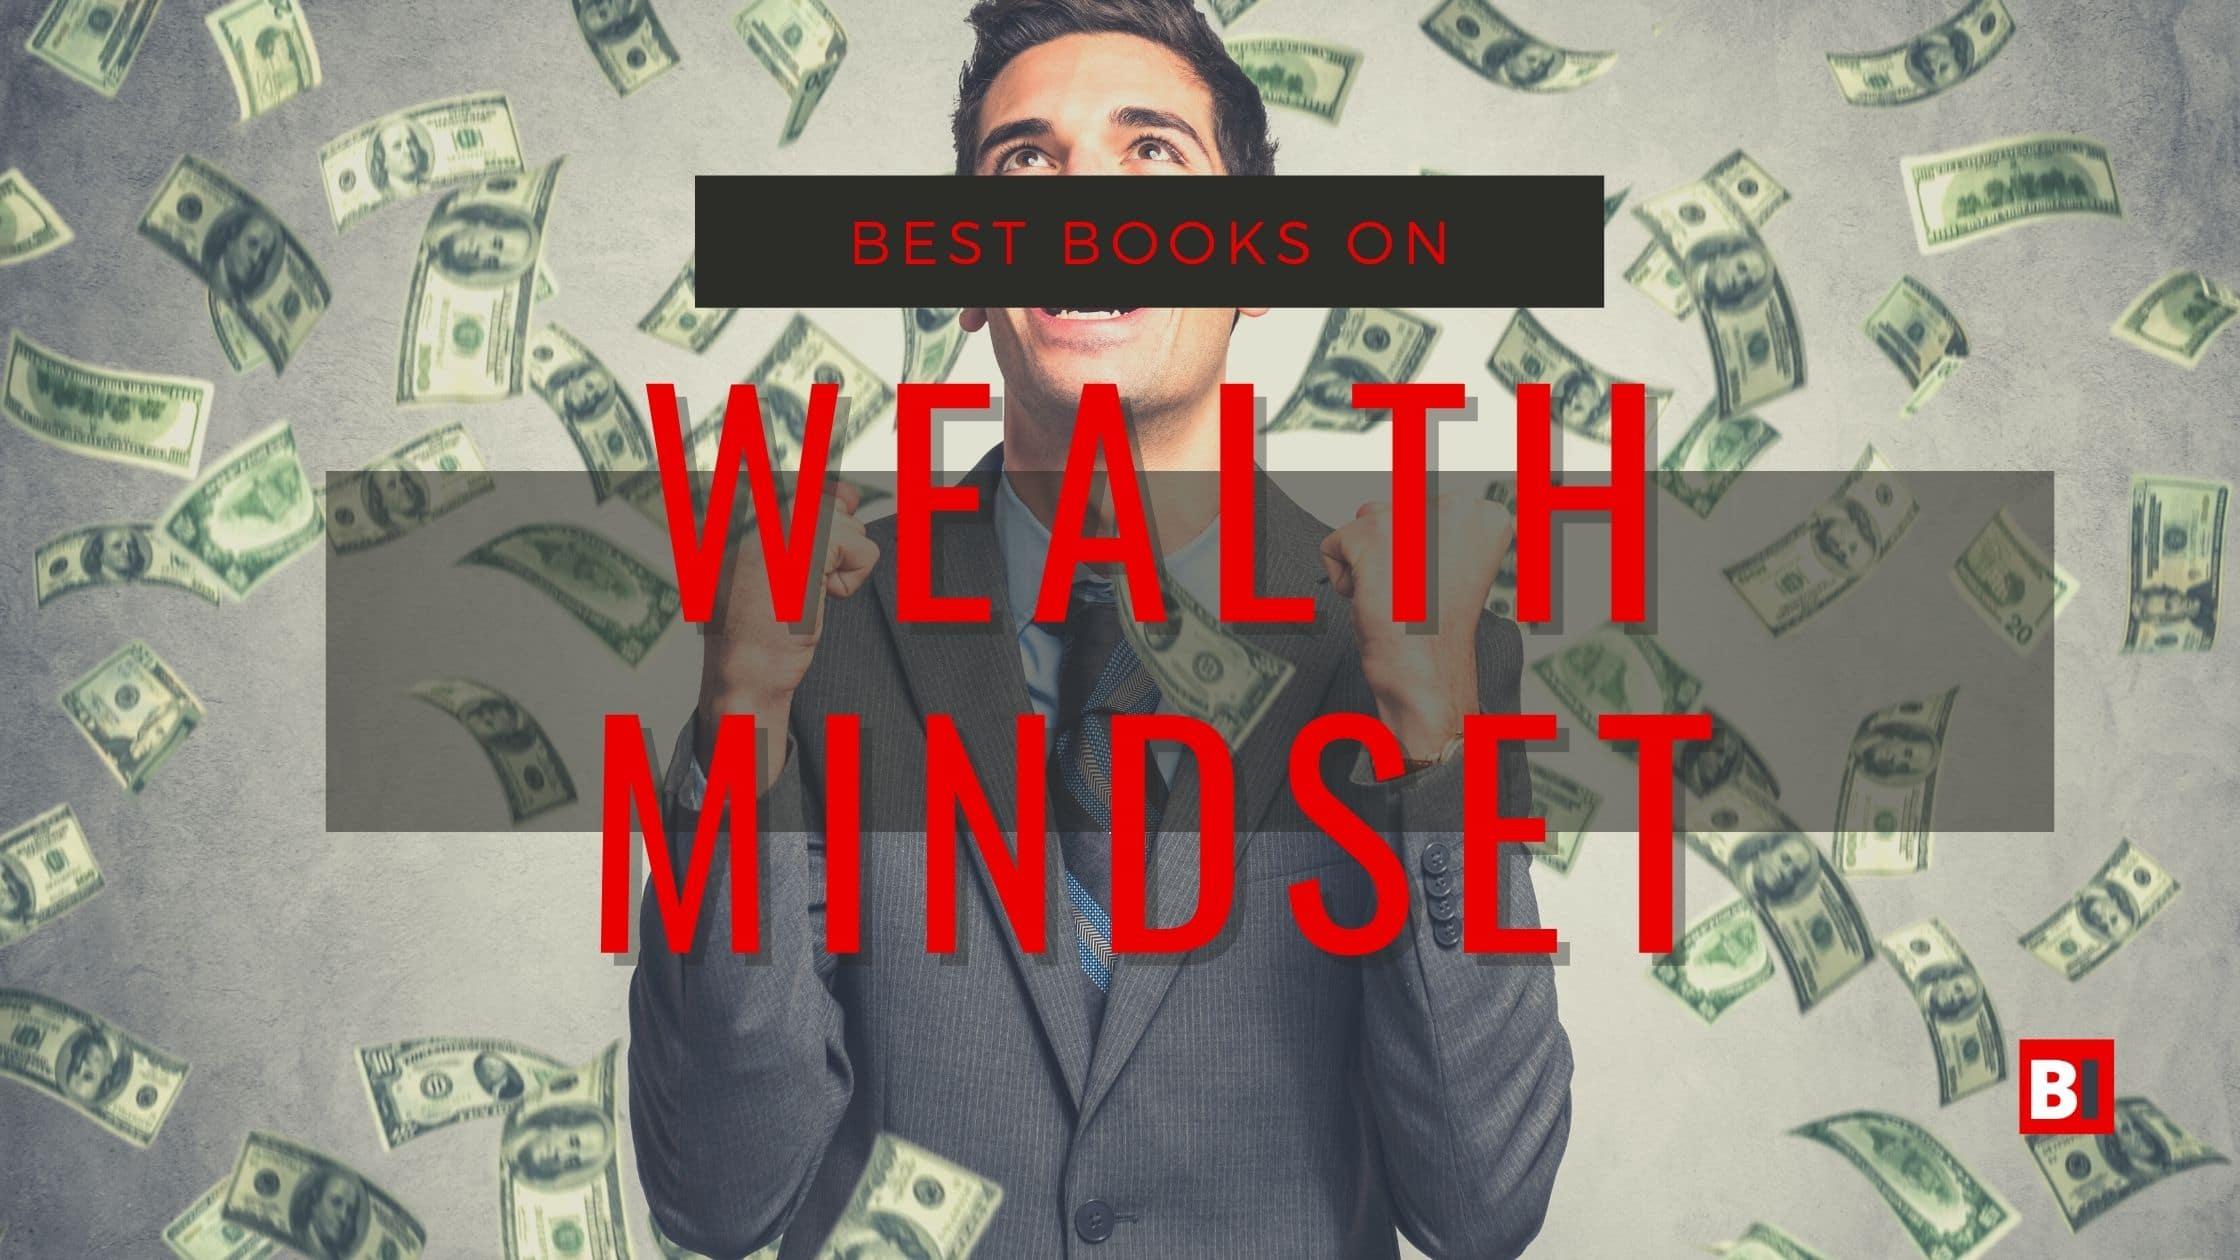 Best Books on Wealth Mindset